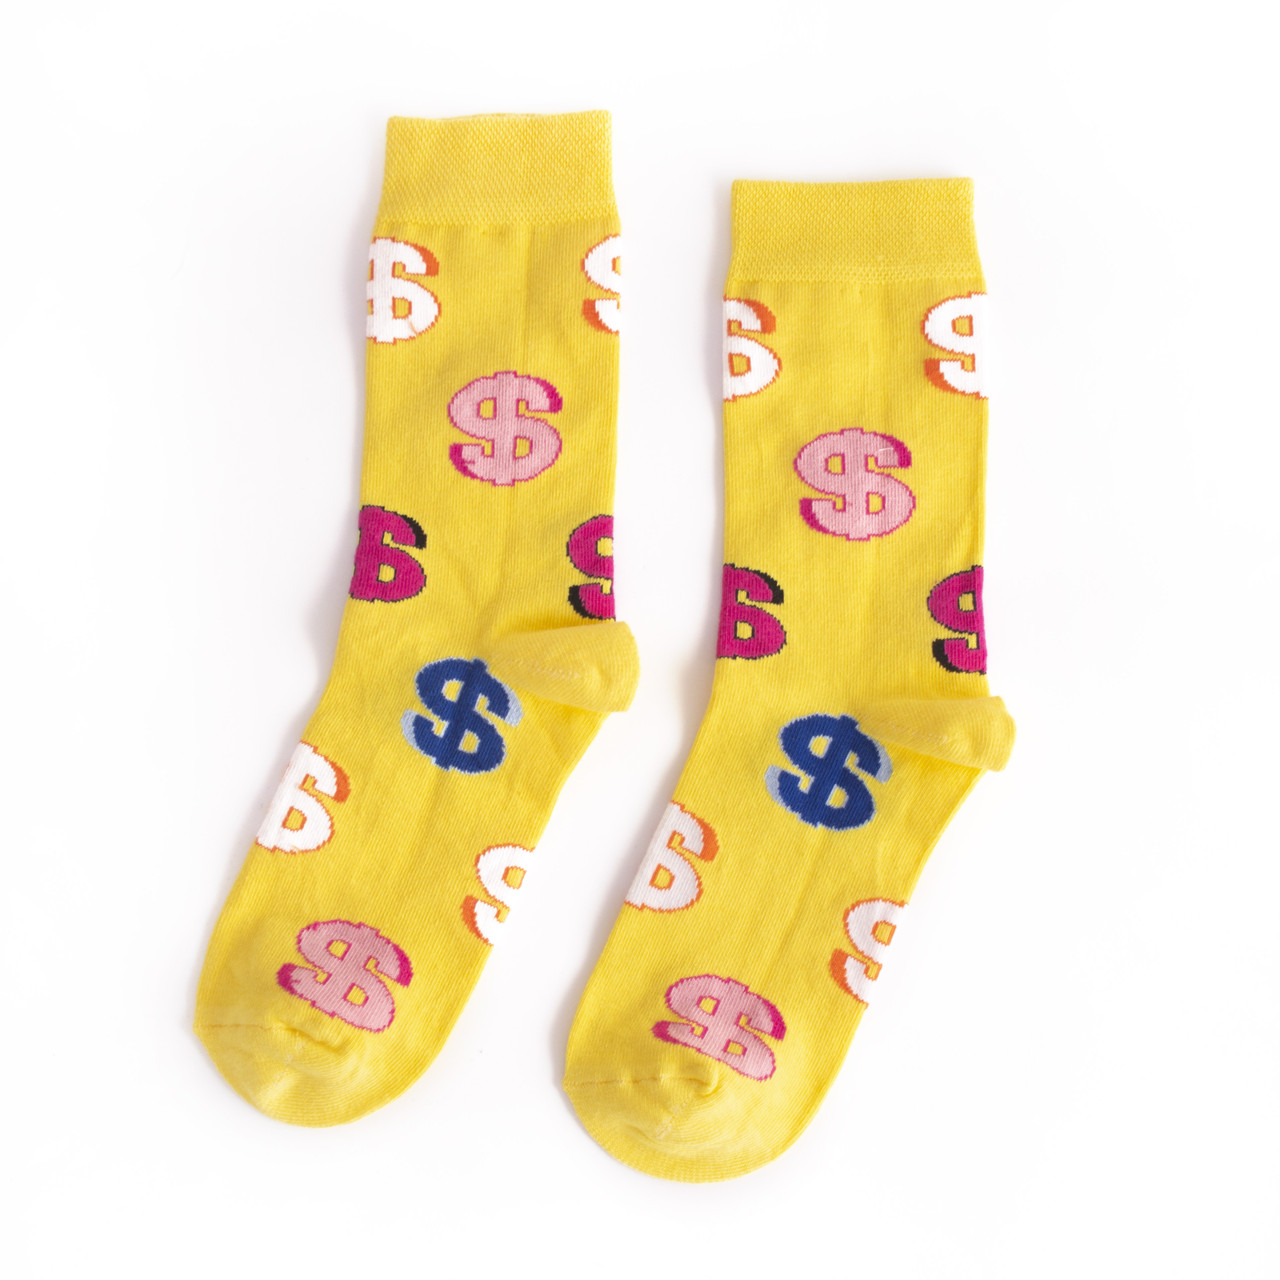 Мужские носки жёлтые Долар